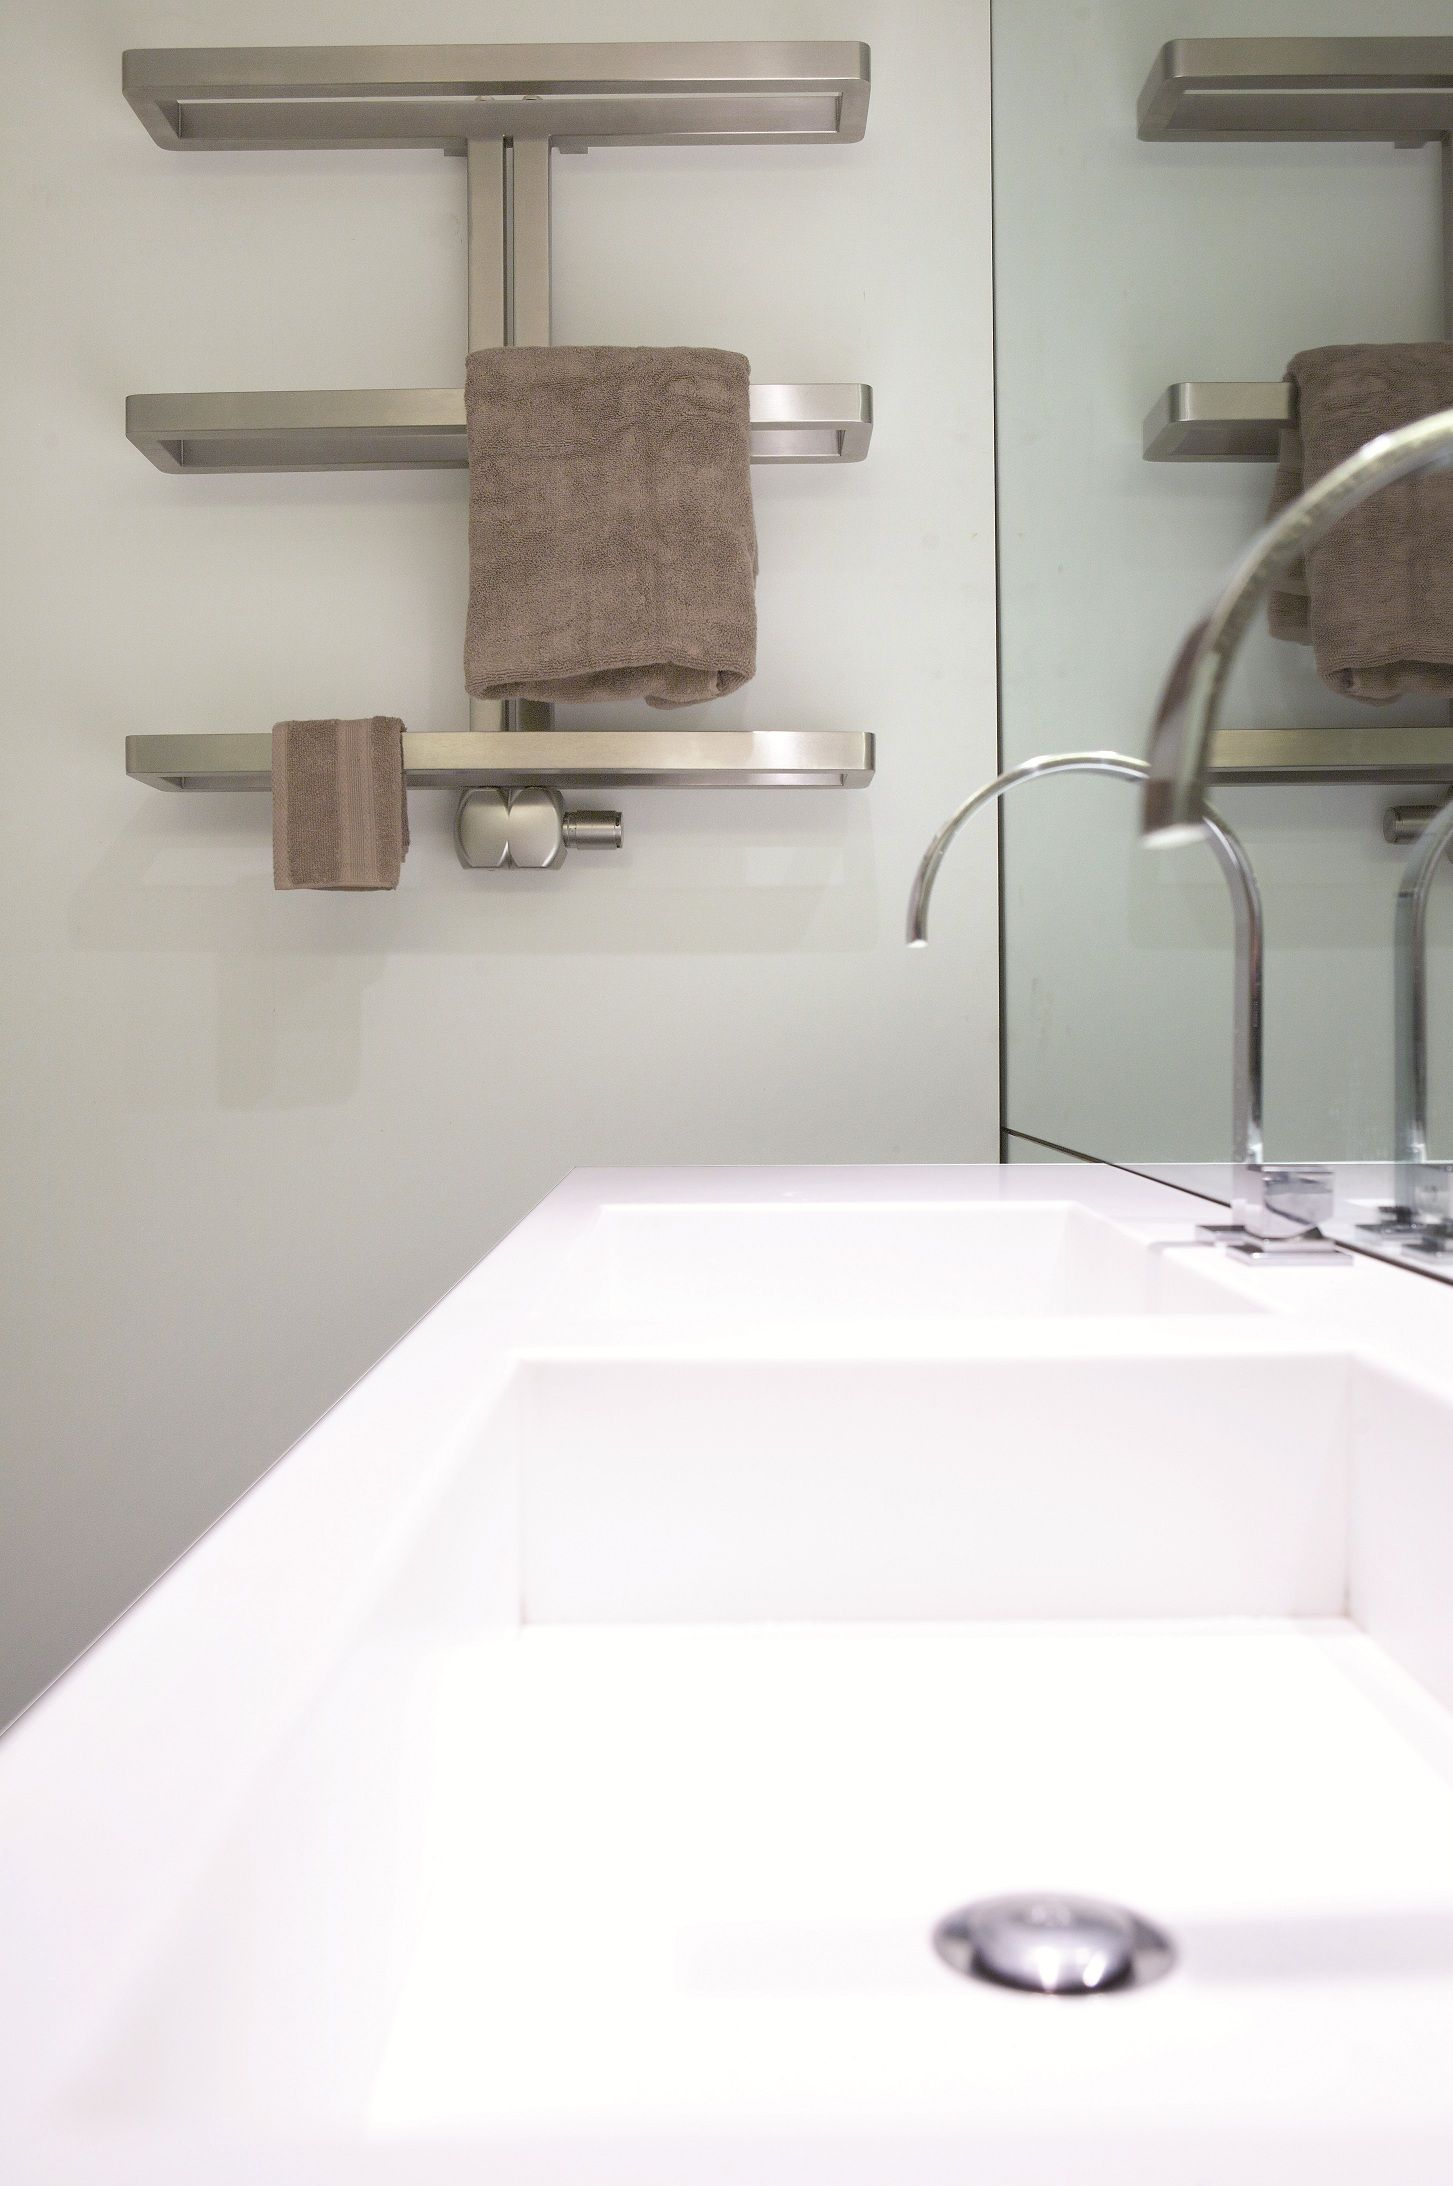 Small heated towel rails for bathrooms - Aeon Gallant Towel Radiator